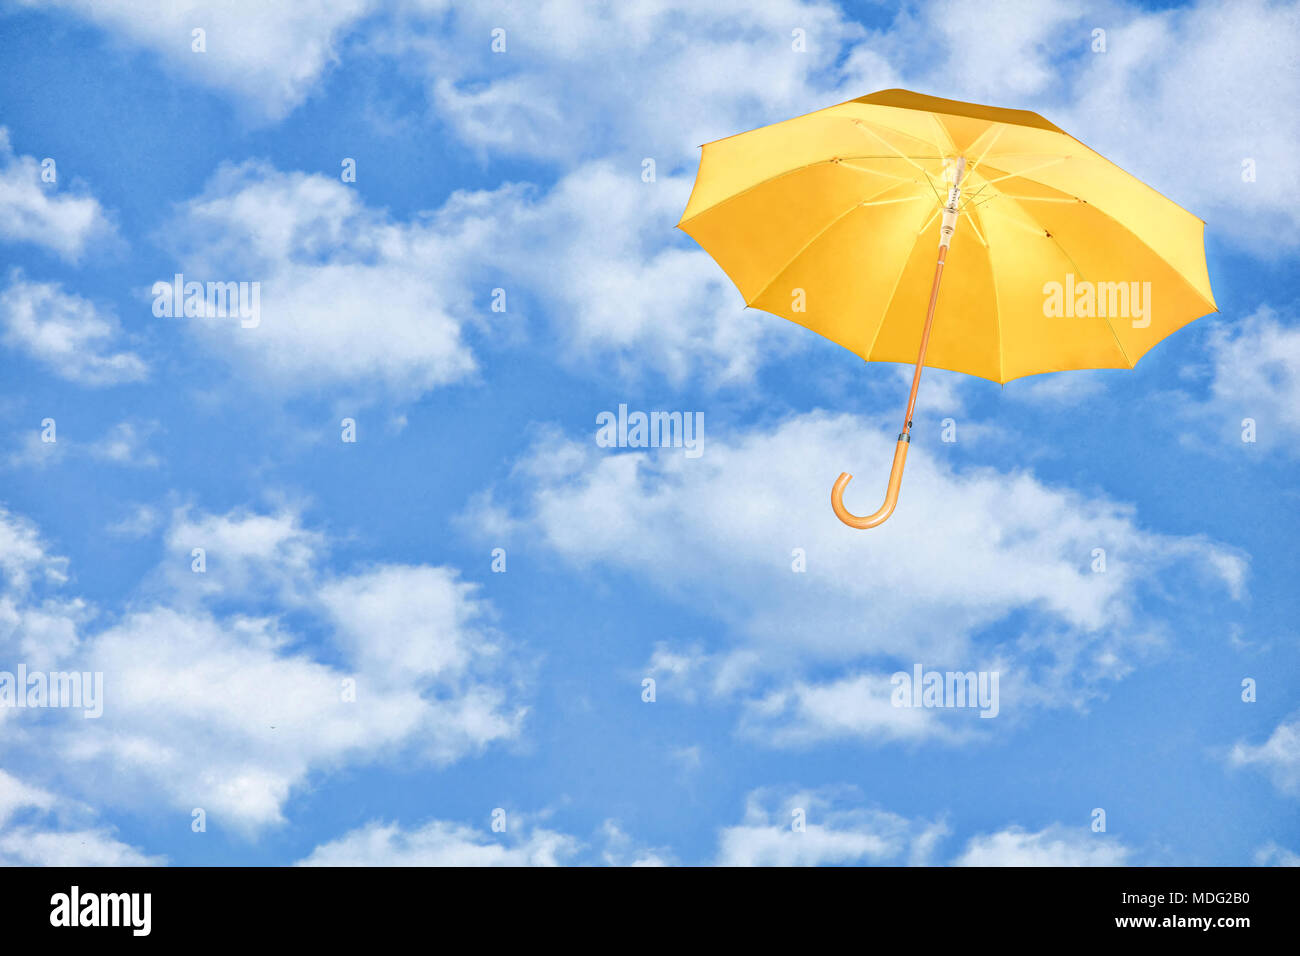 Mary Poppins Schirm Yellow Umbrella Fliegt In Den Himmel Gegen